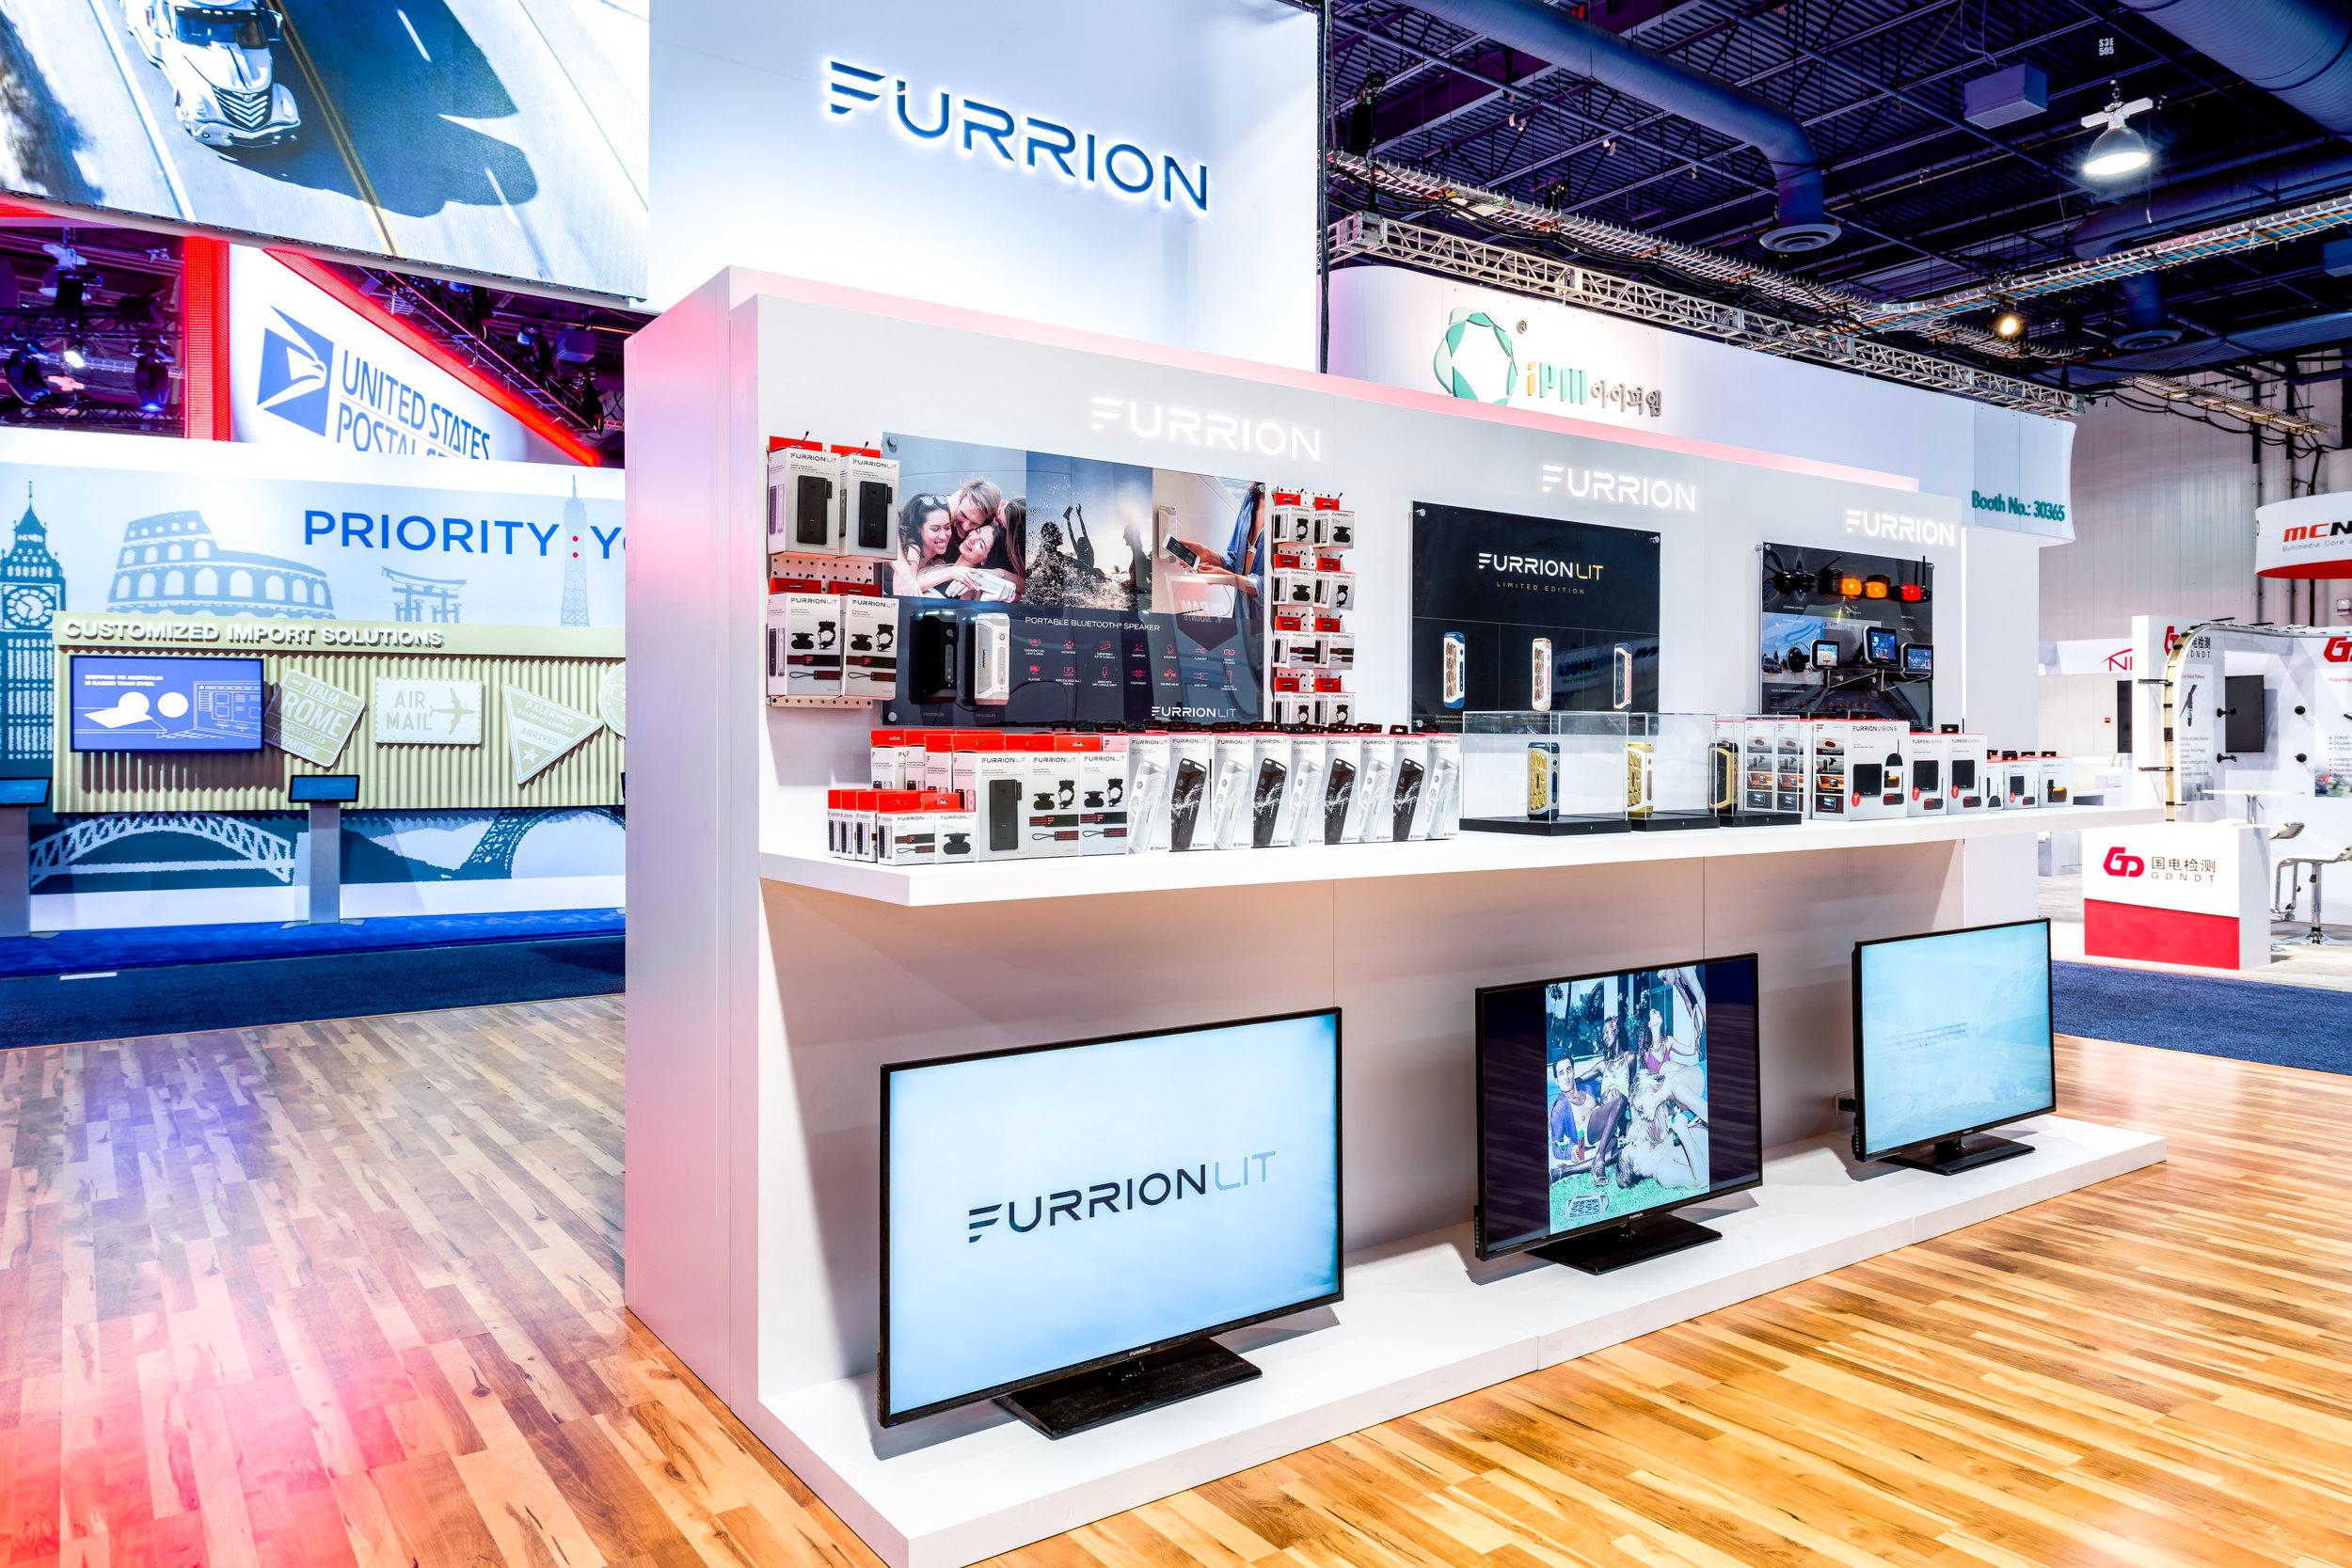 Furrion_CES18-05.jpg